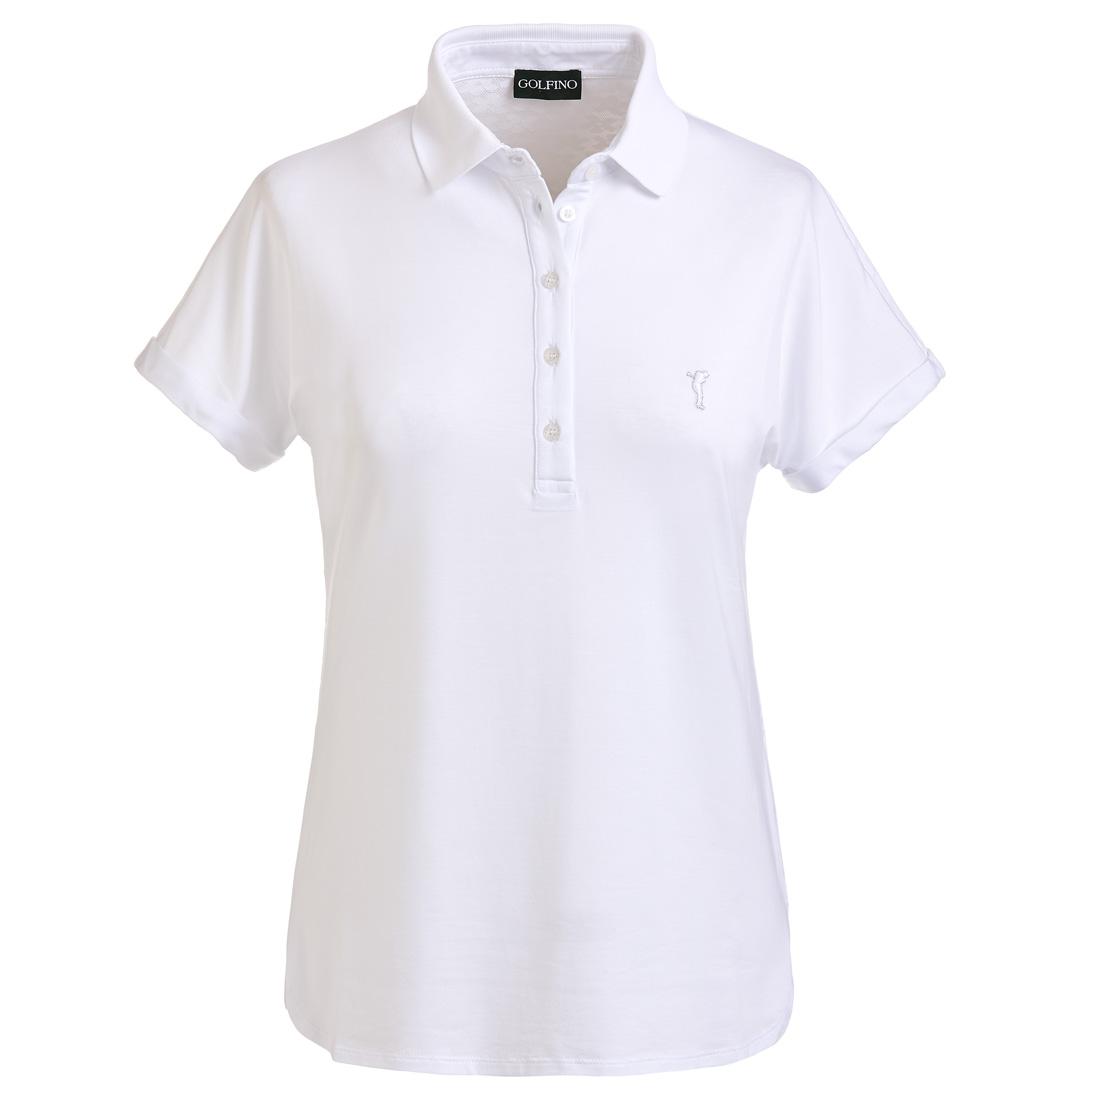 Loose Fit Damen Golfpolo mit Rückenteil aus Spitze